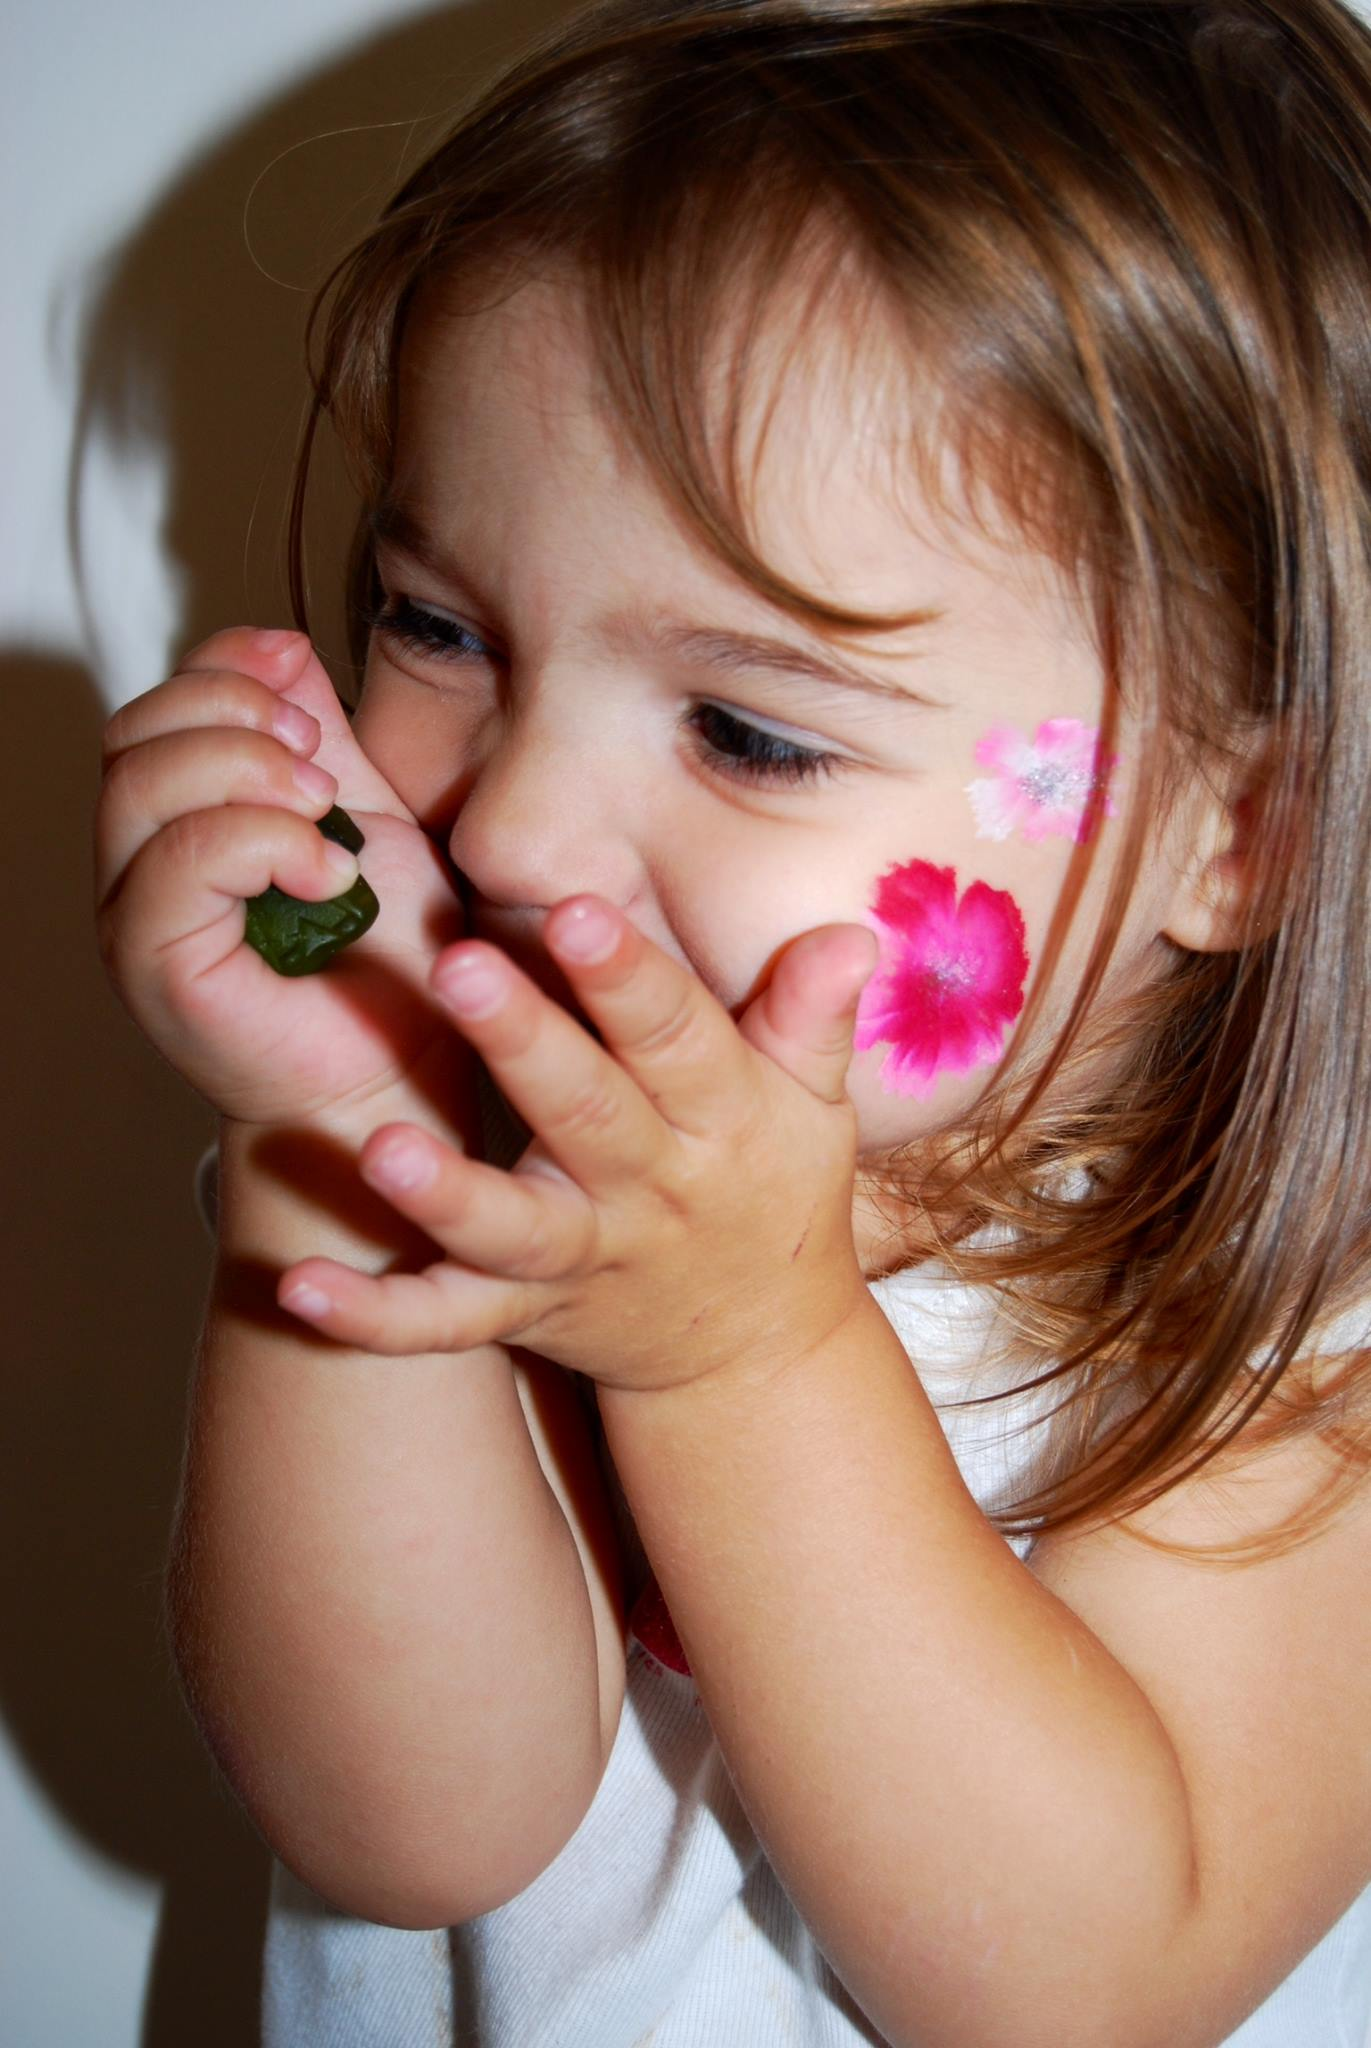 Maquillage enfant - Fleurs